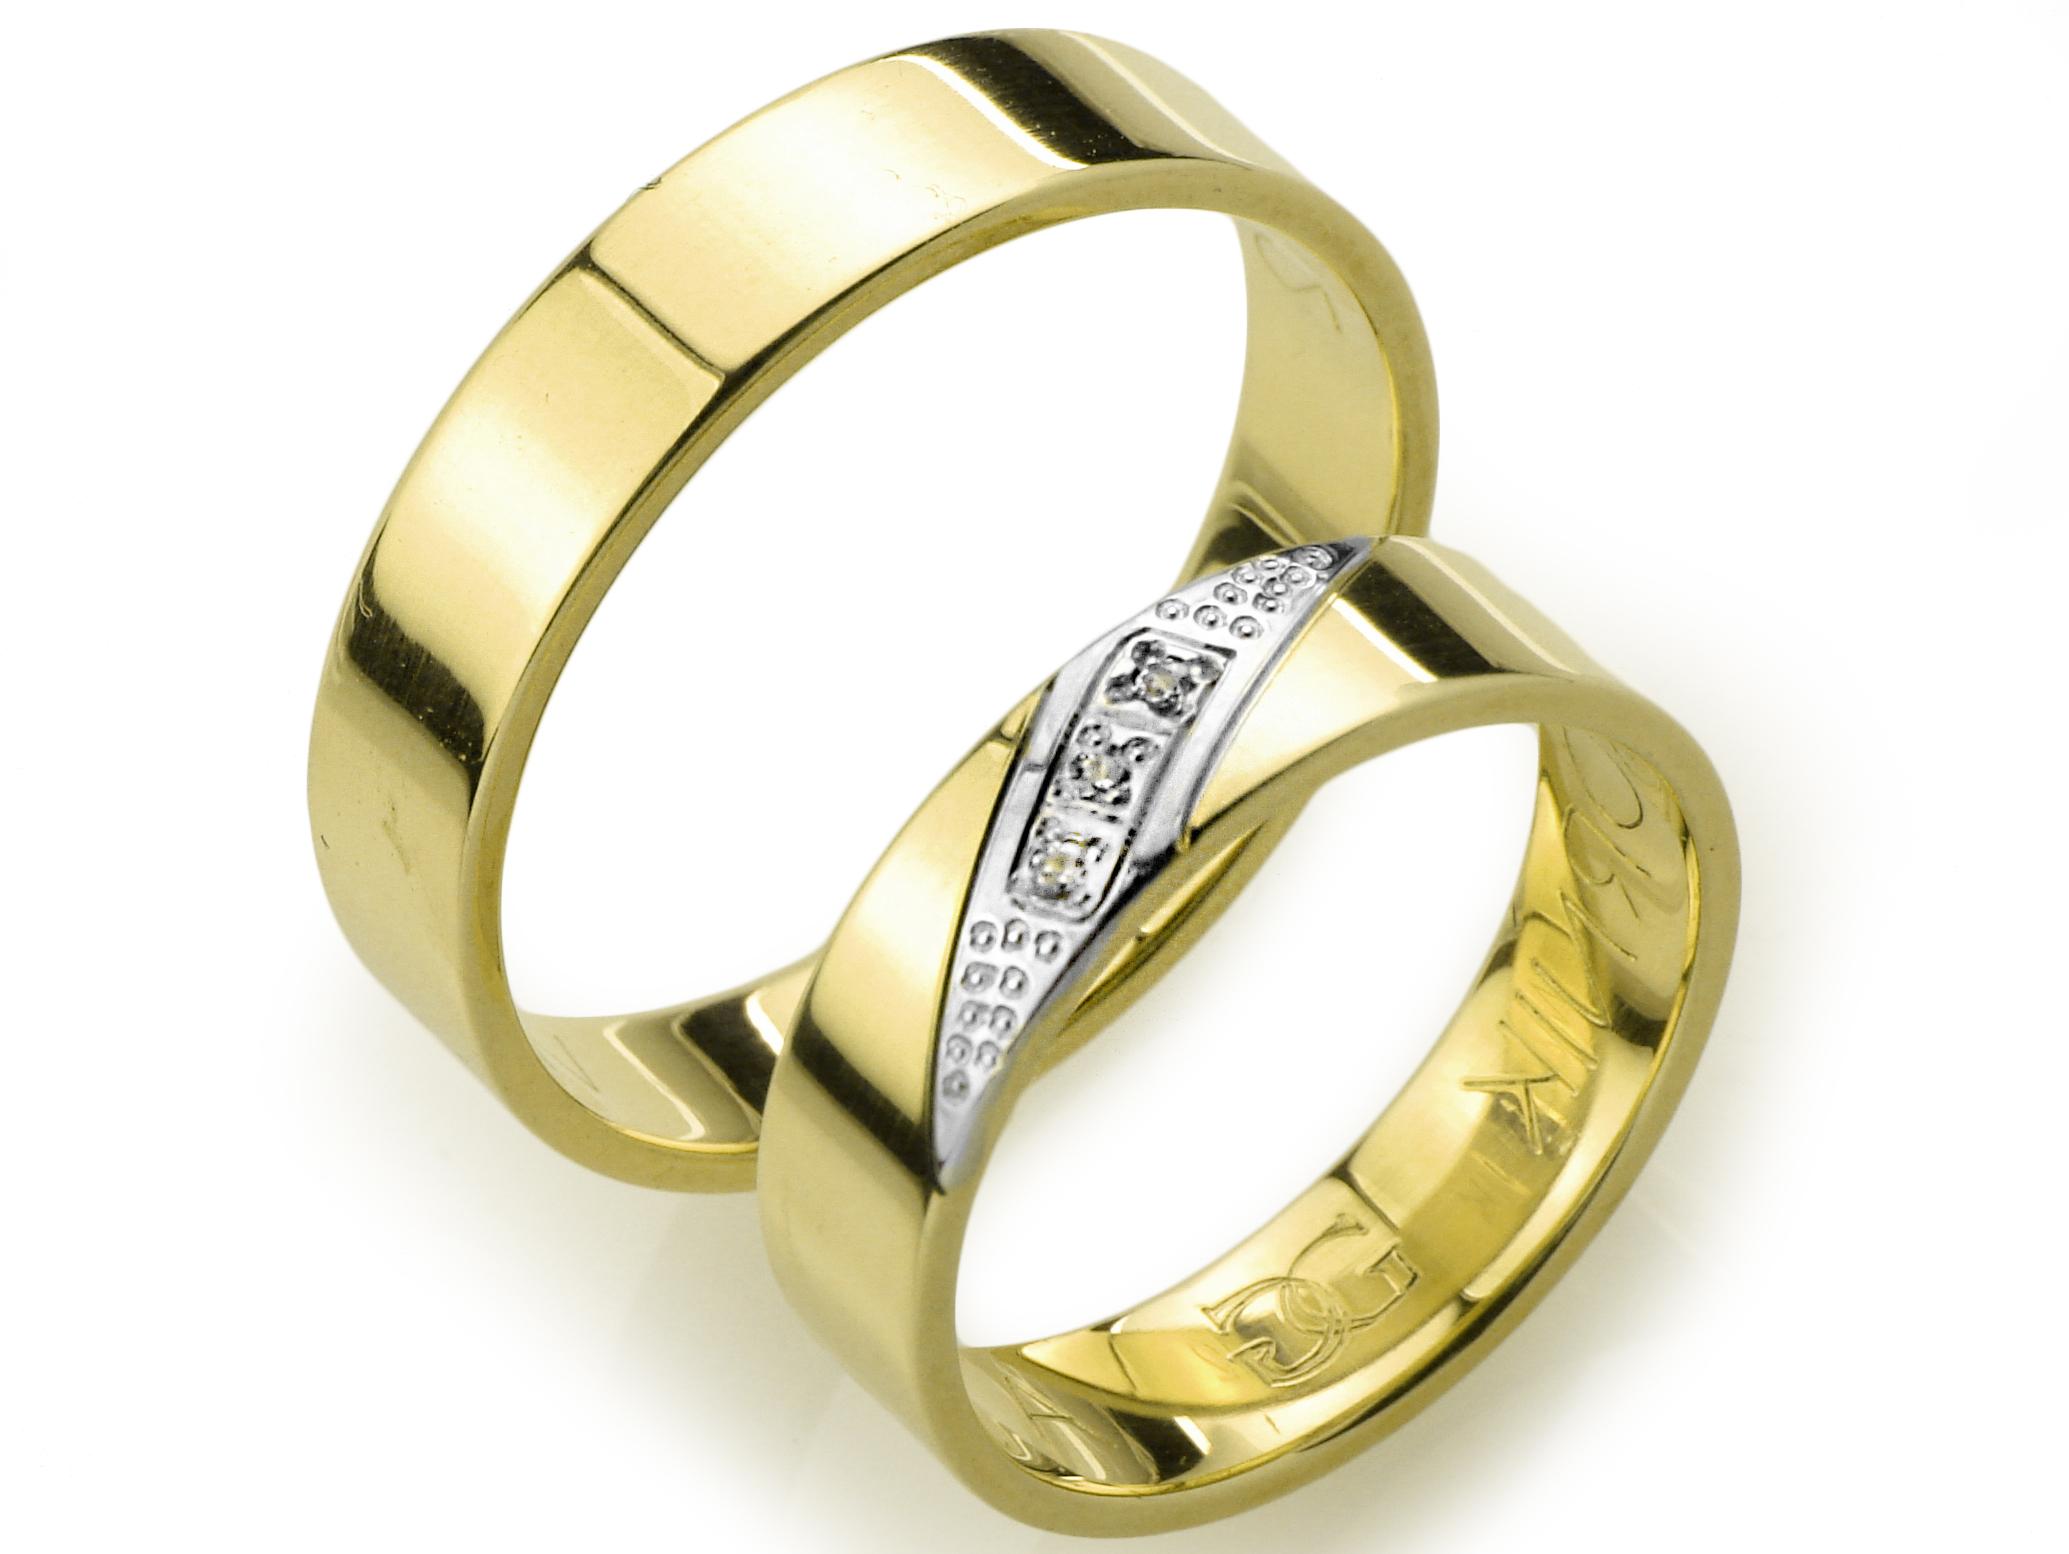 Item GOLDRUN GOLD WEDDING RING A-12 5MM PAIR